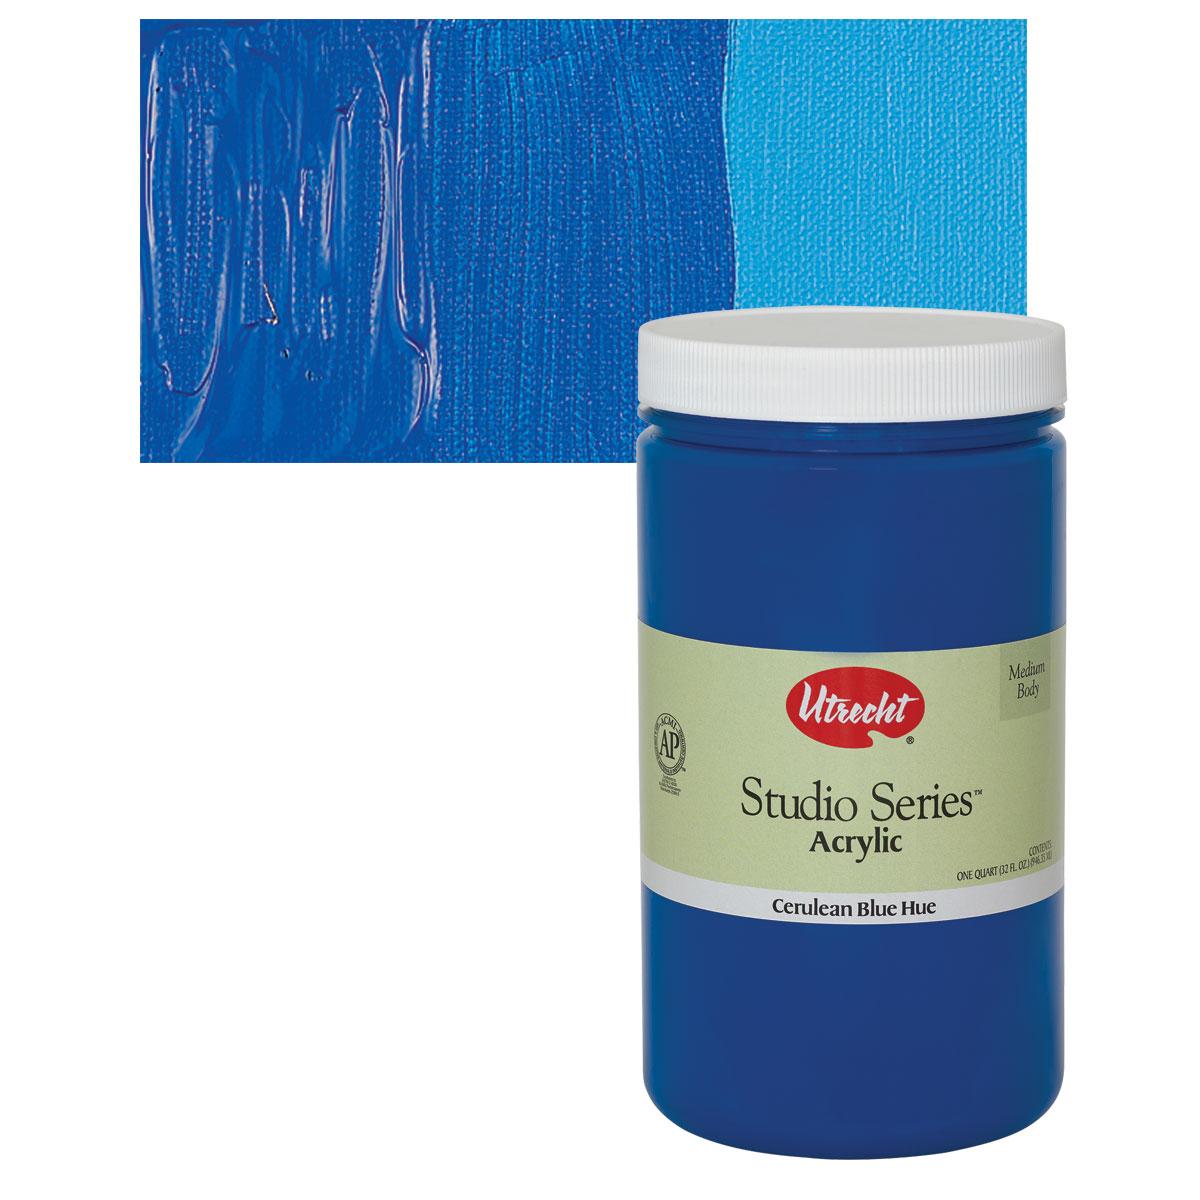 Utrecht Studio Series Acrylic Paint - Cerulean Blue Hue, Quart